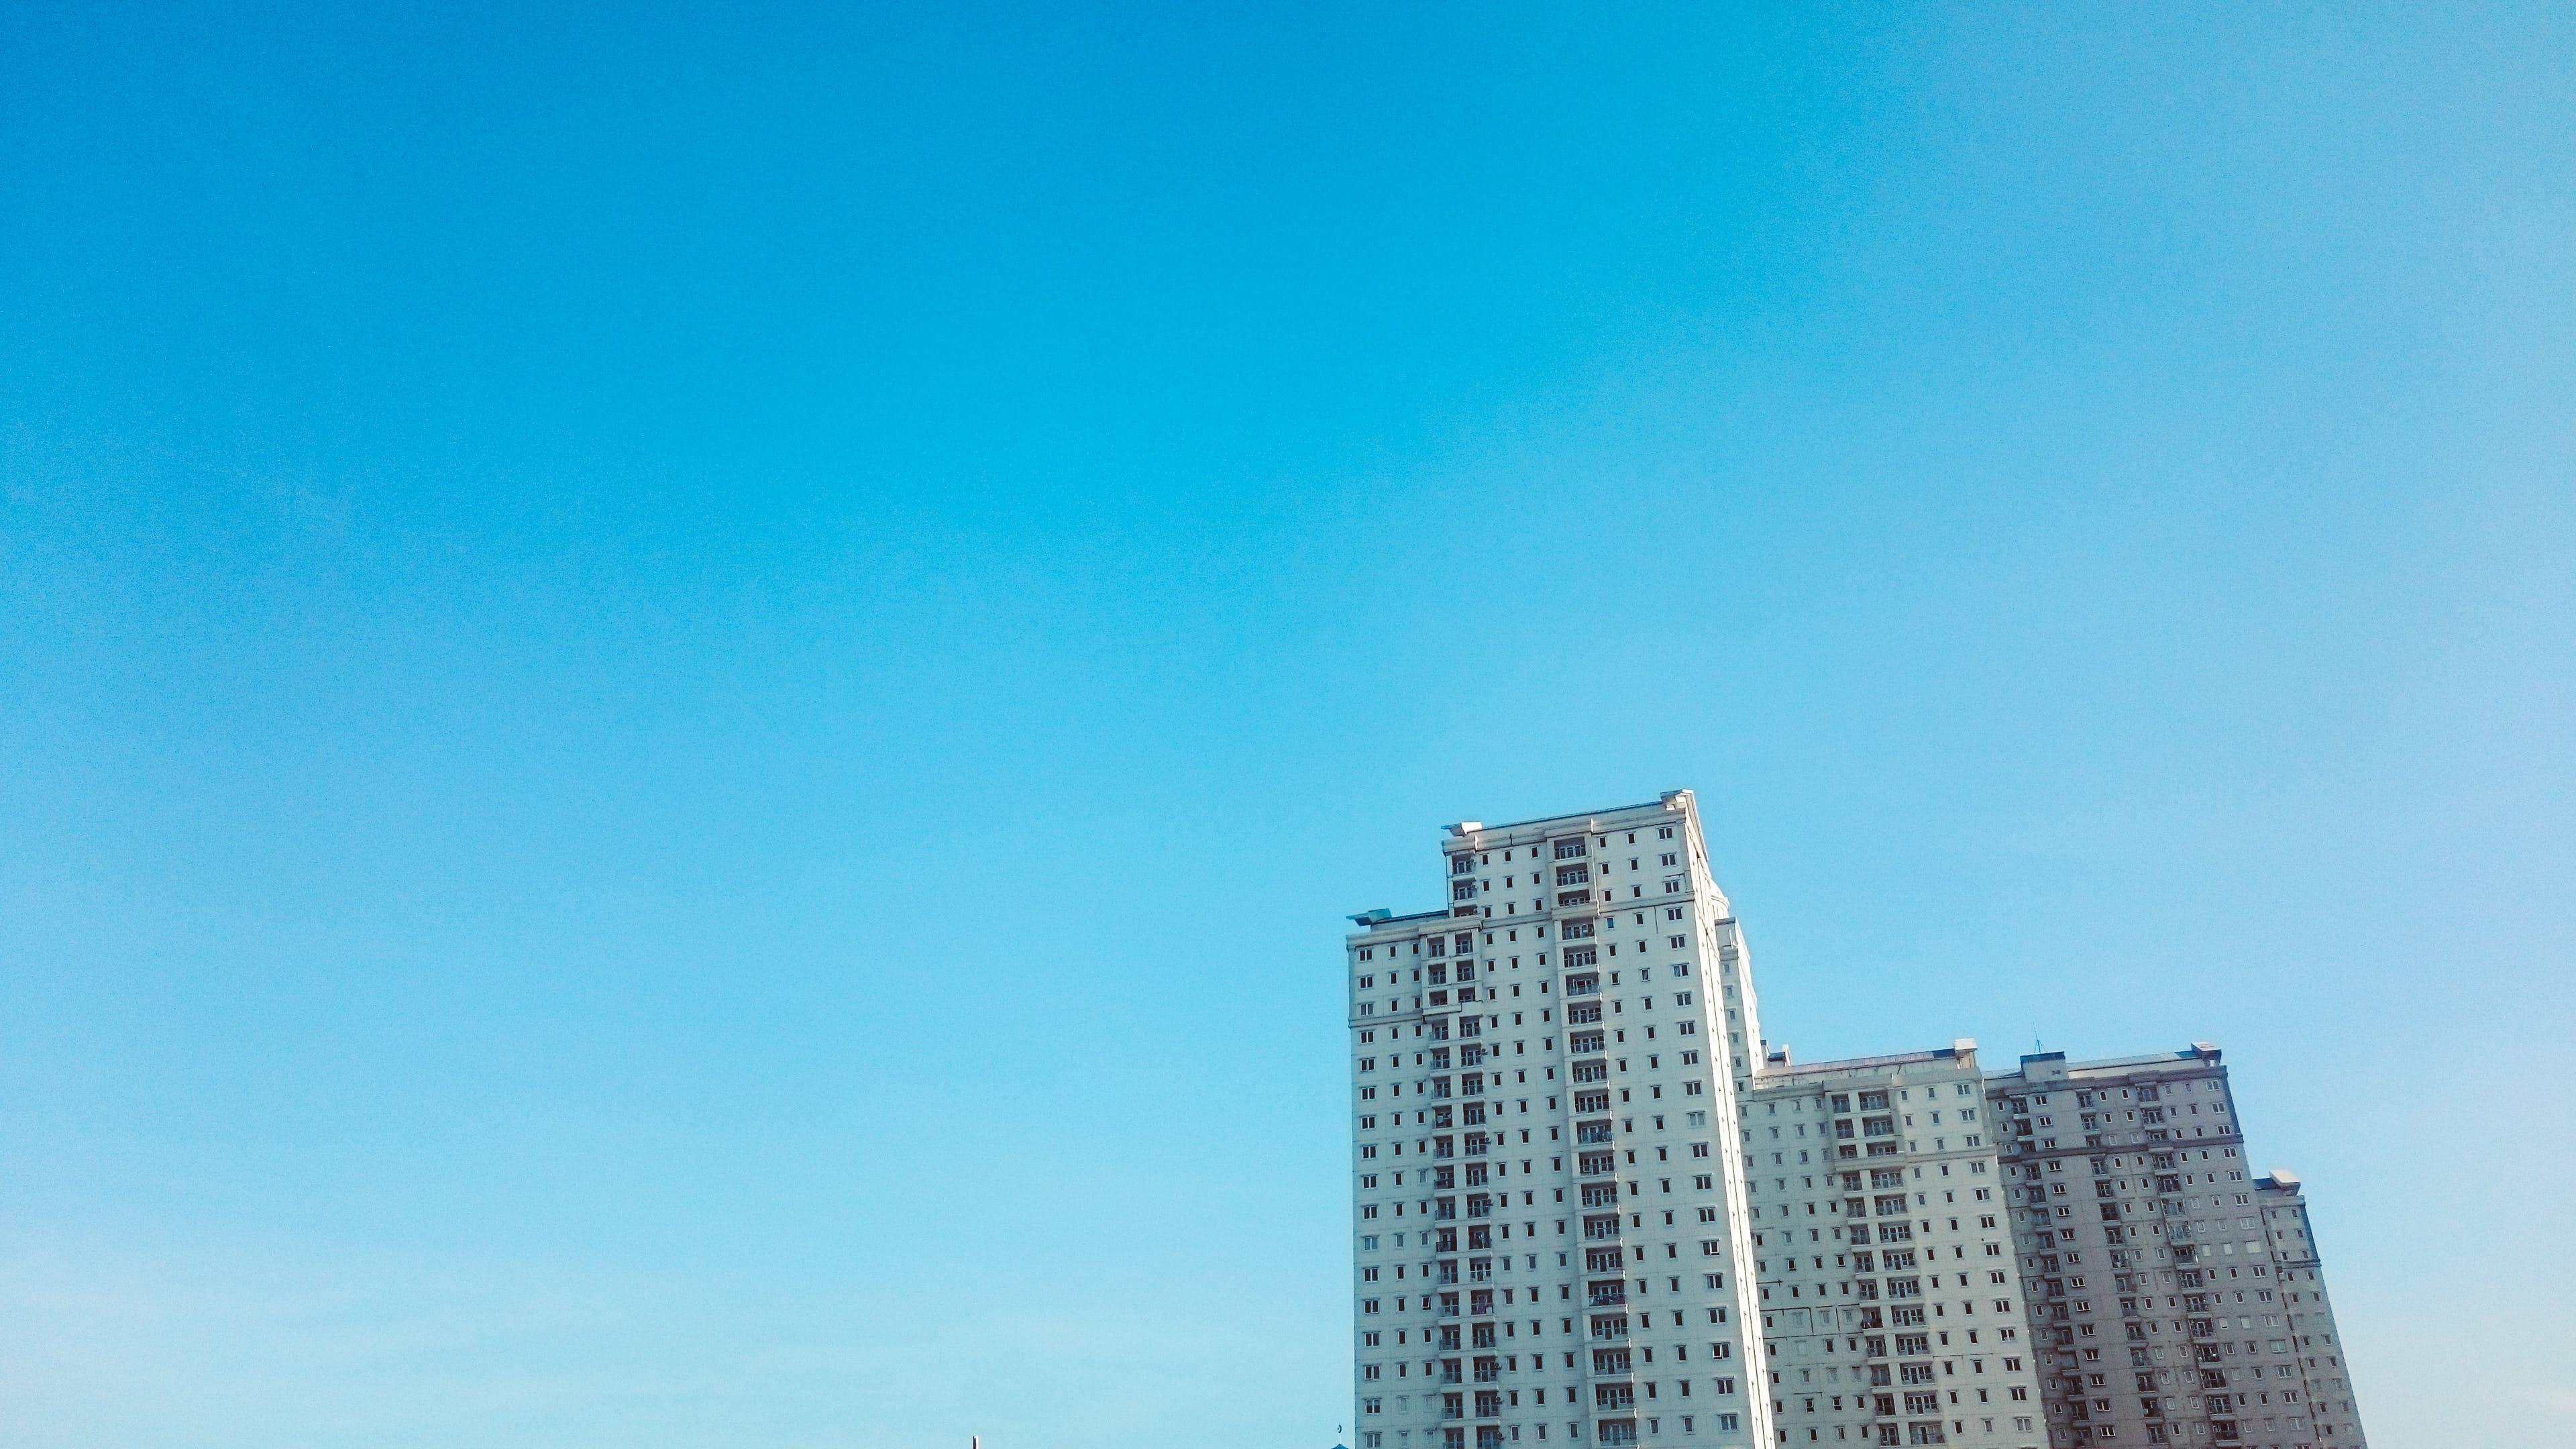 Kostenloses Stock Foto zu stadt, himmel, skyline, büro